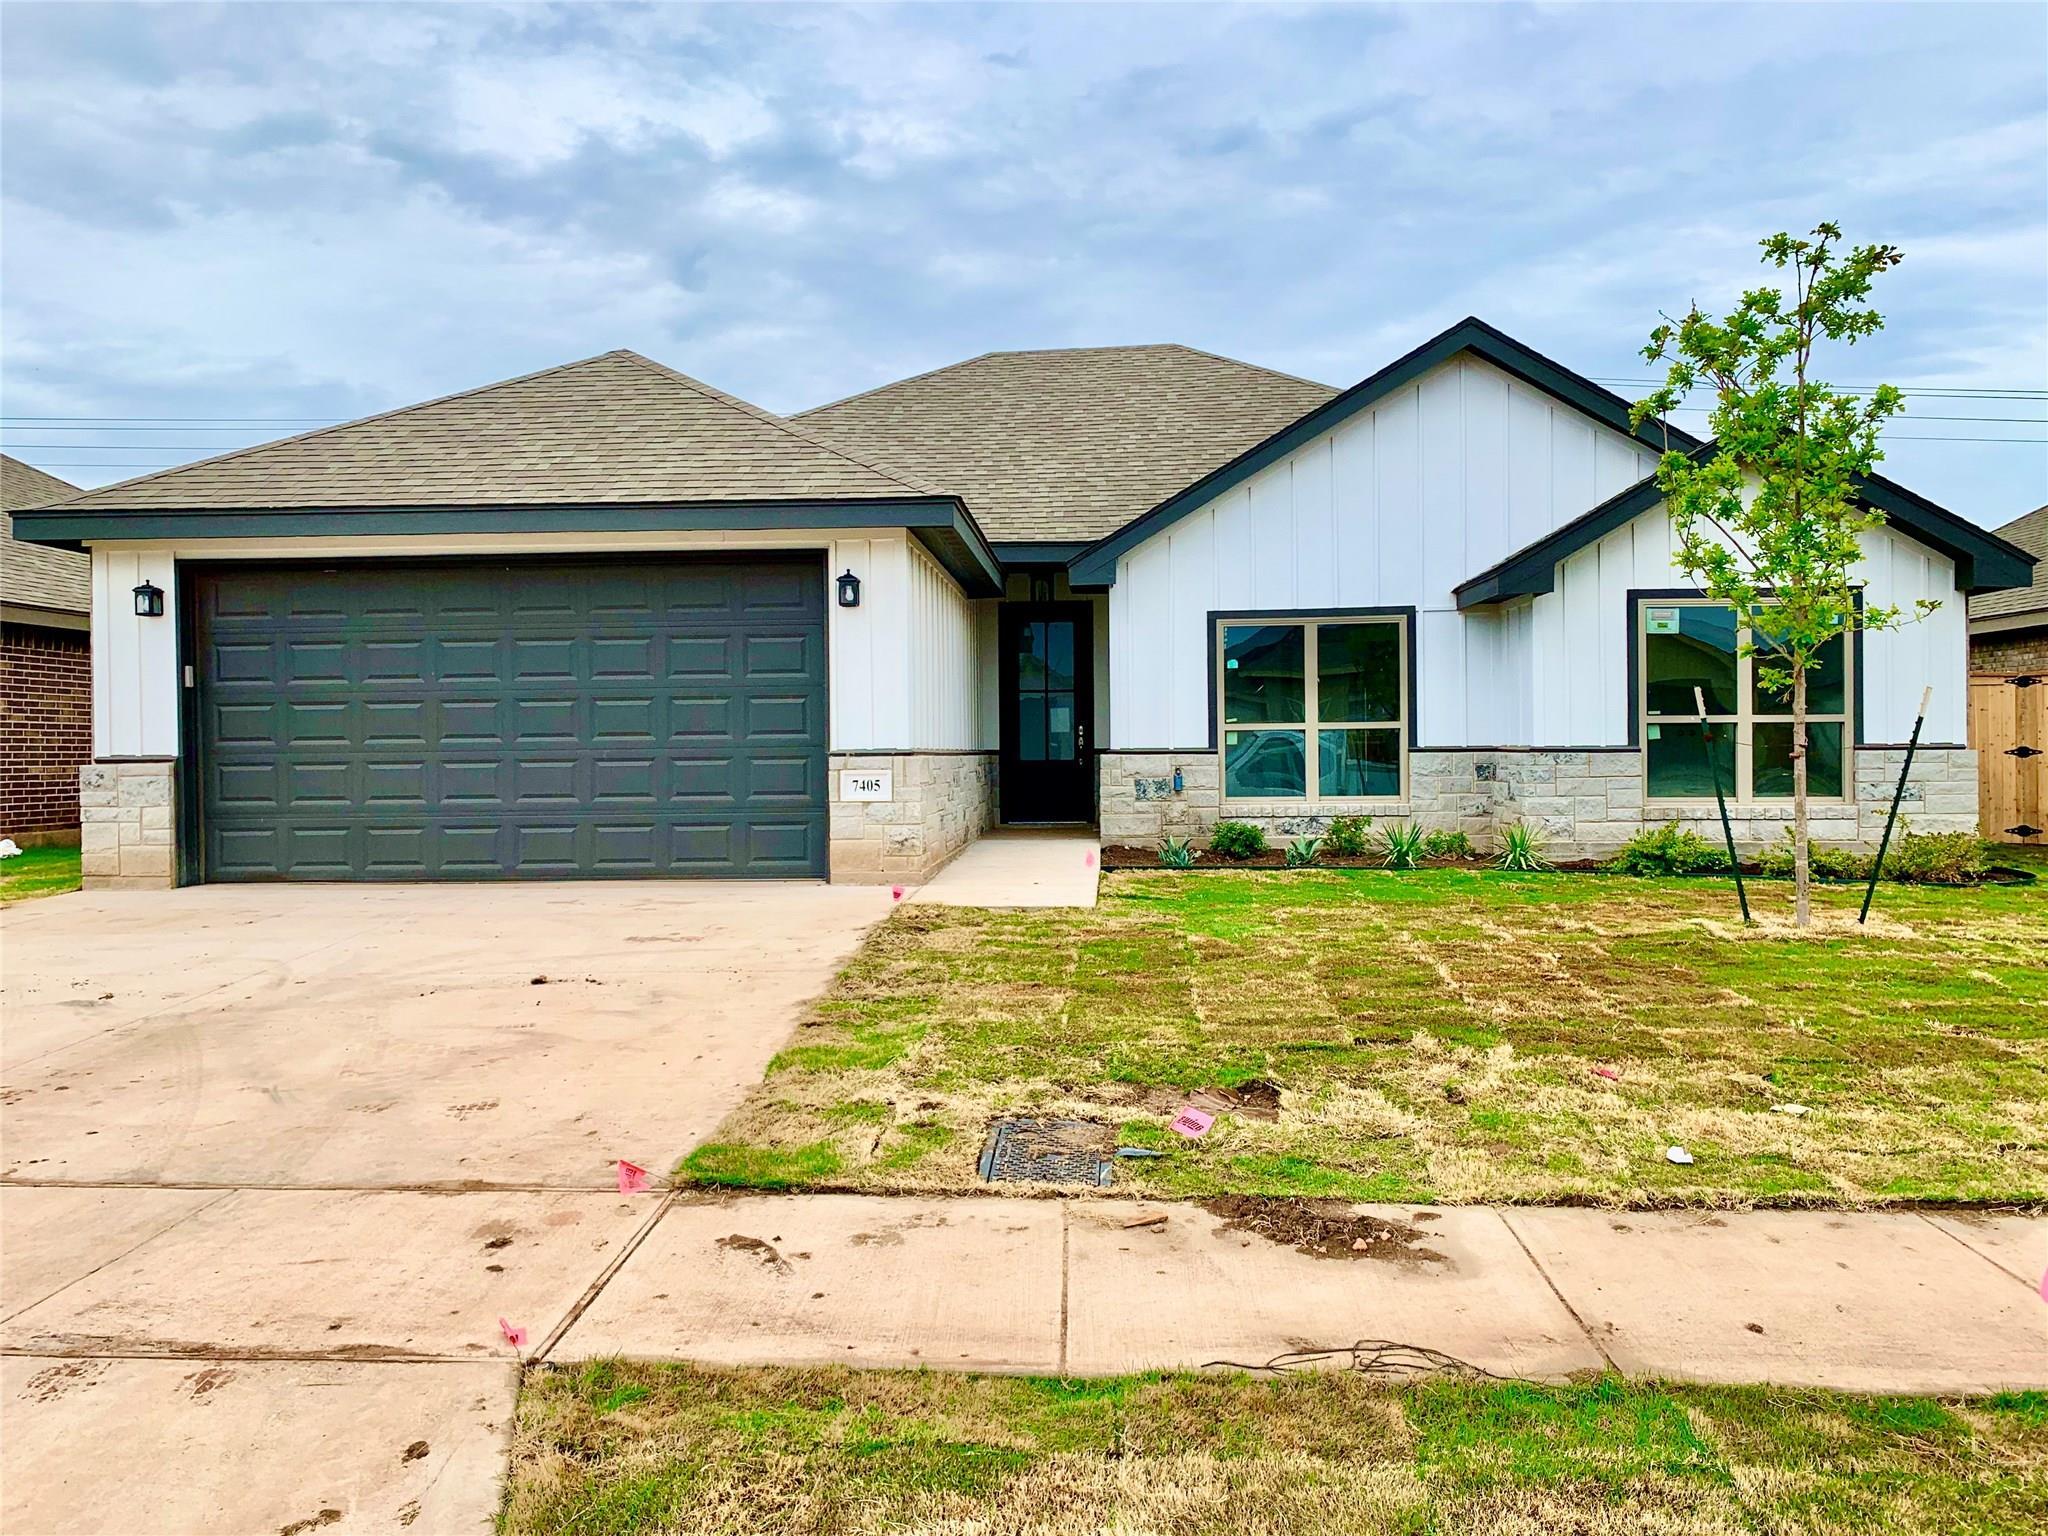 San Angelo Custom Home Builder - 7405 Wildflower Way, Abilene TX 79602